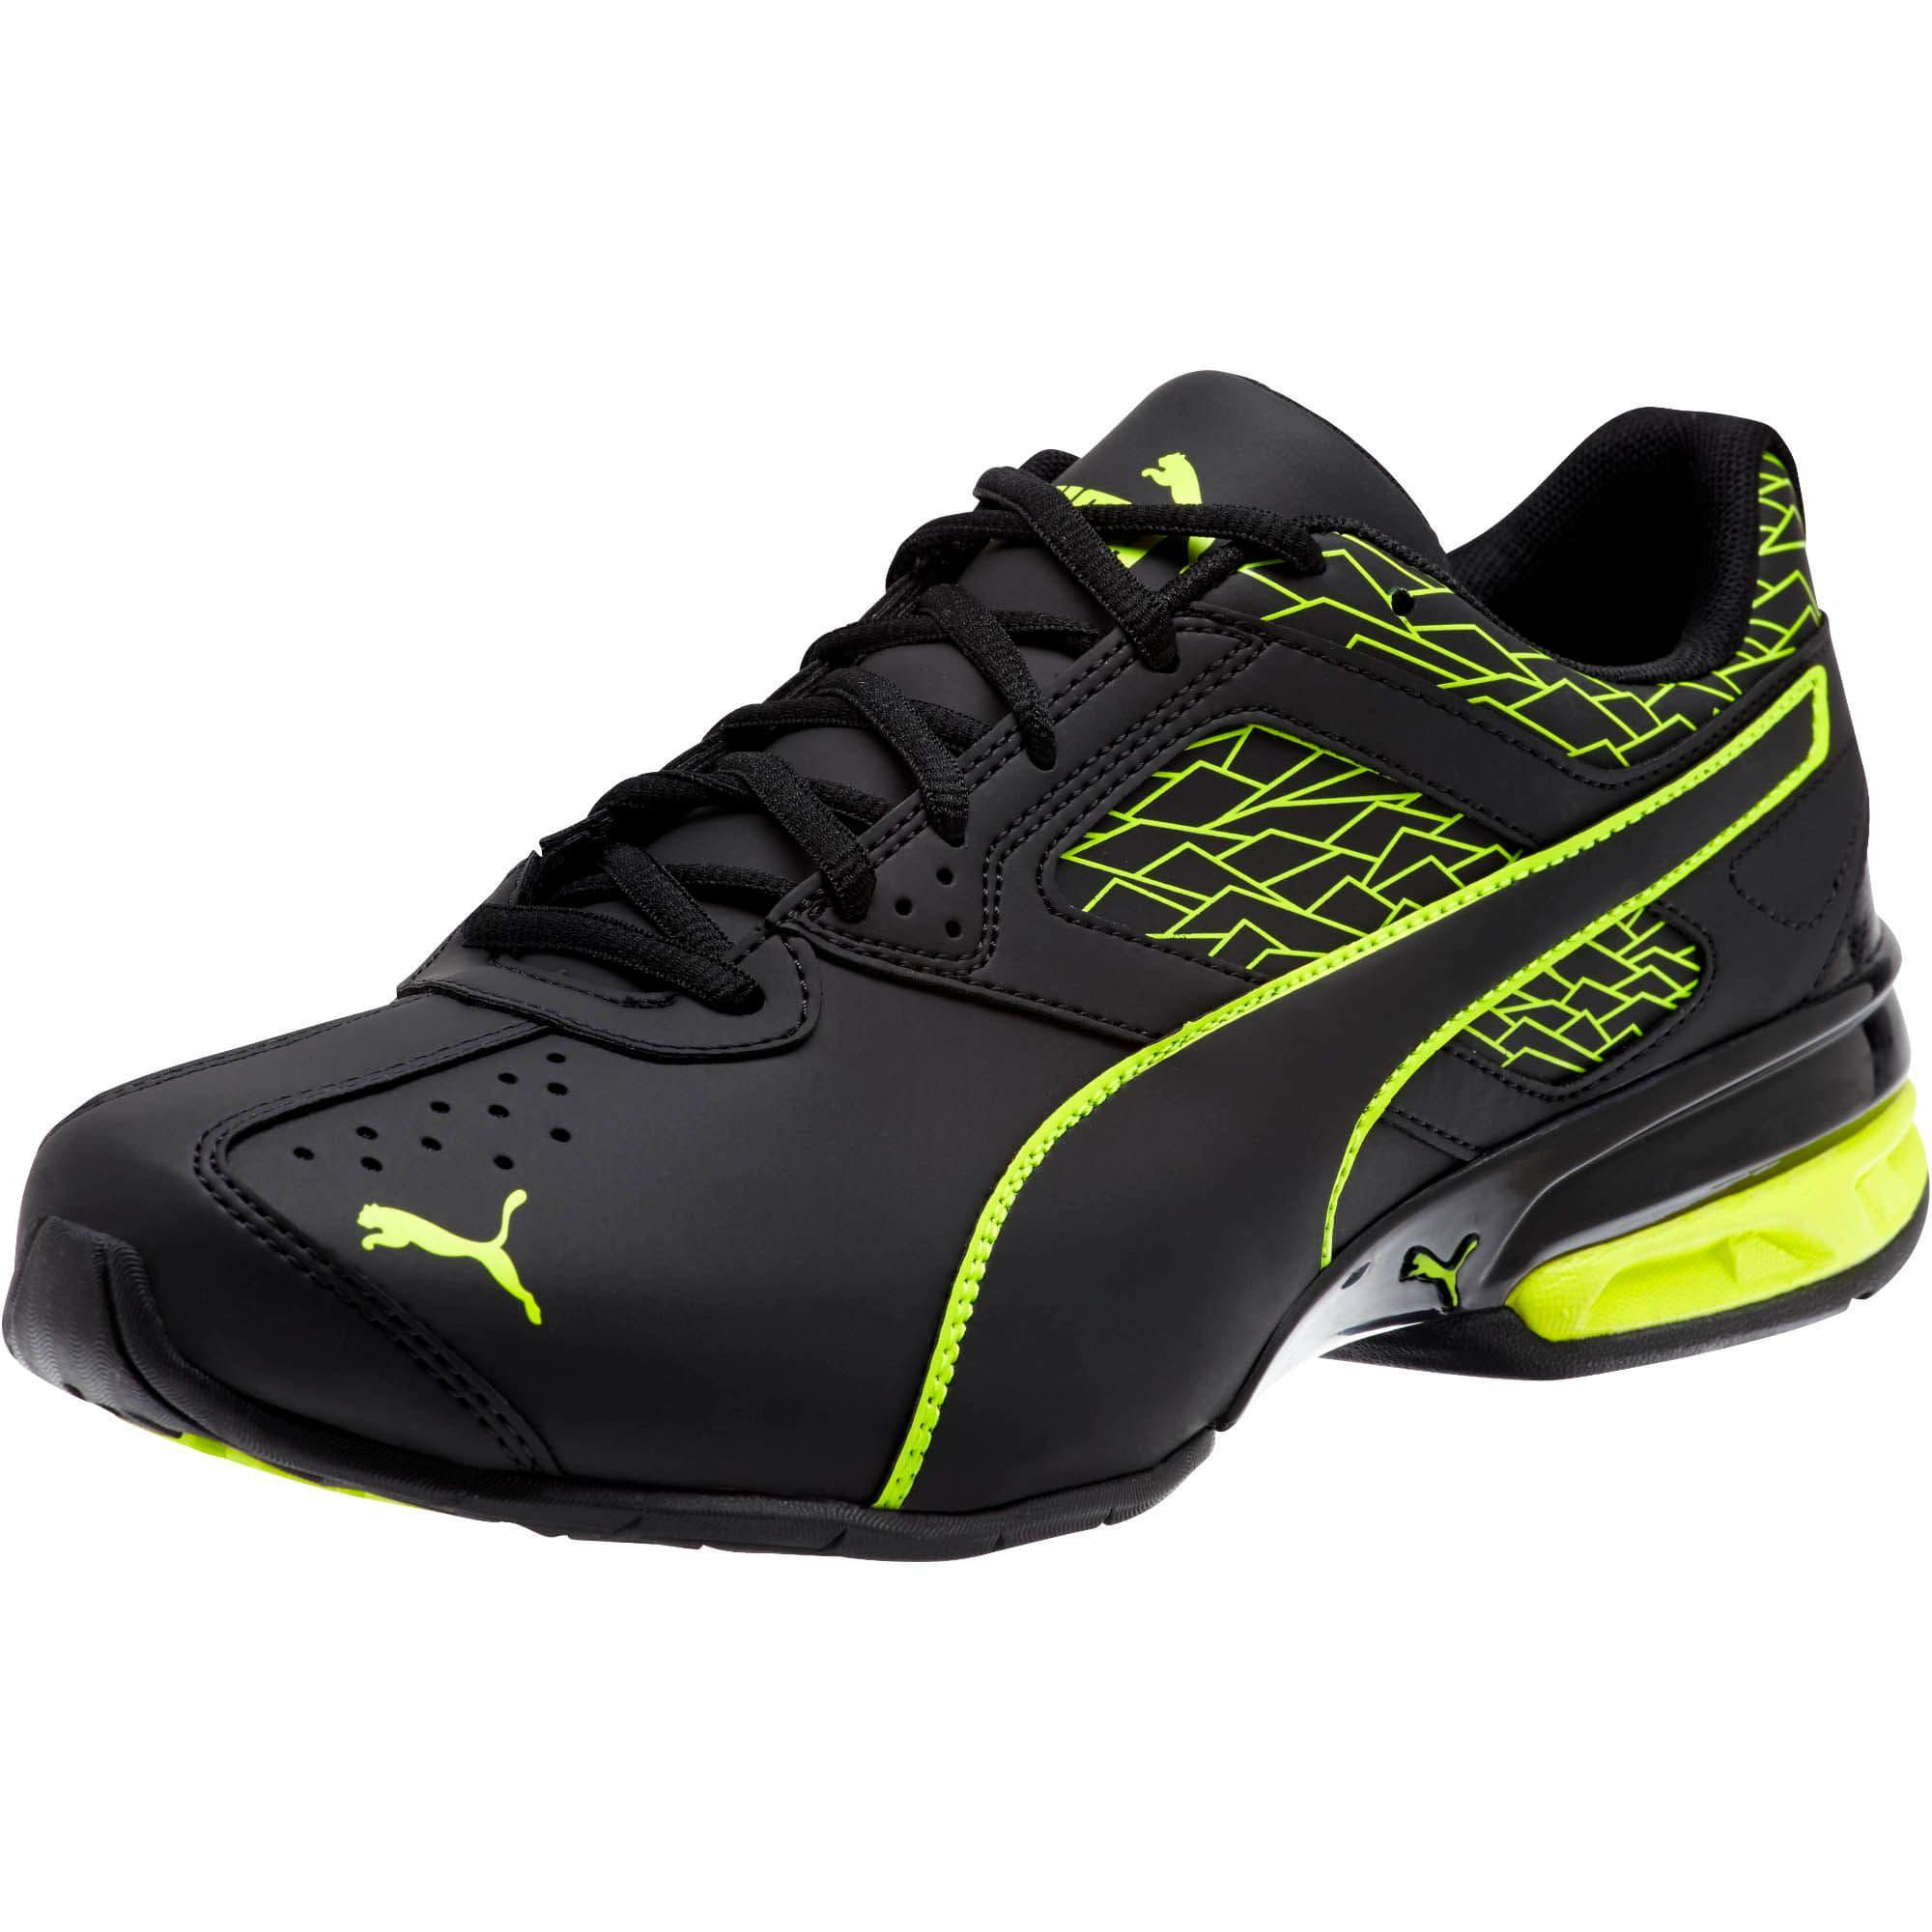 Thumbnail 1 of Tazon 6 Fracture FM Men's Sneakers, Puma Black-Safety Yellow, medium